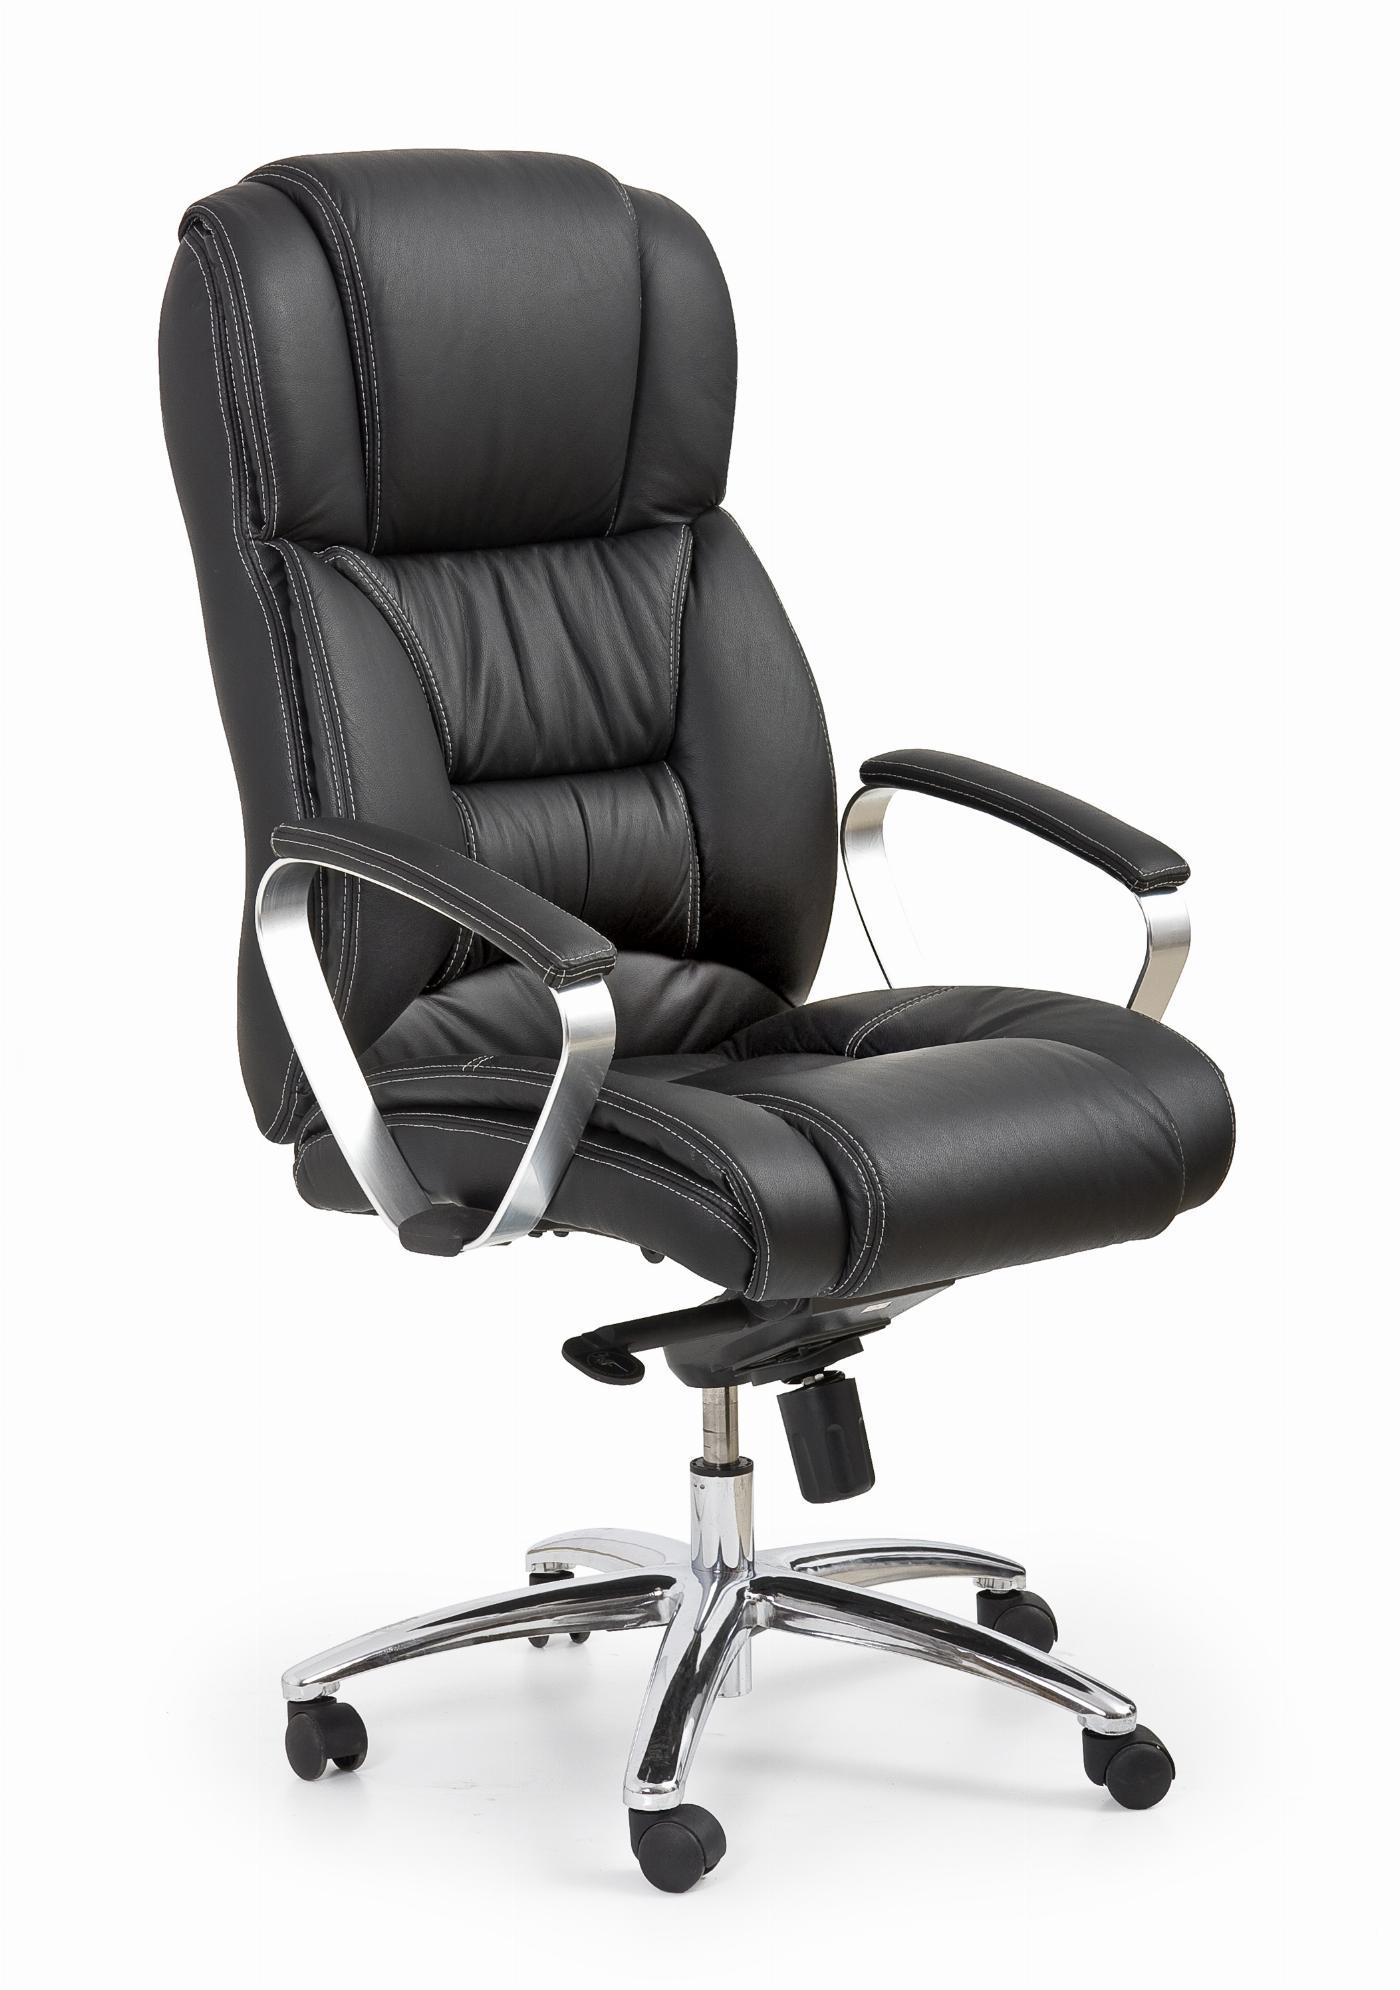 FOSTER fotel gabinetowy czarny - skóra